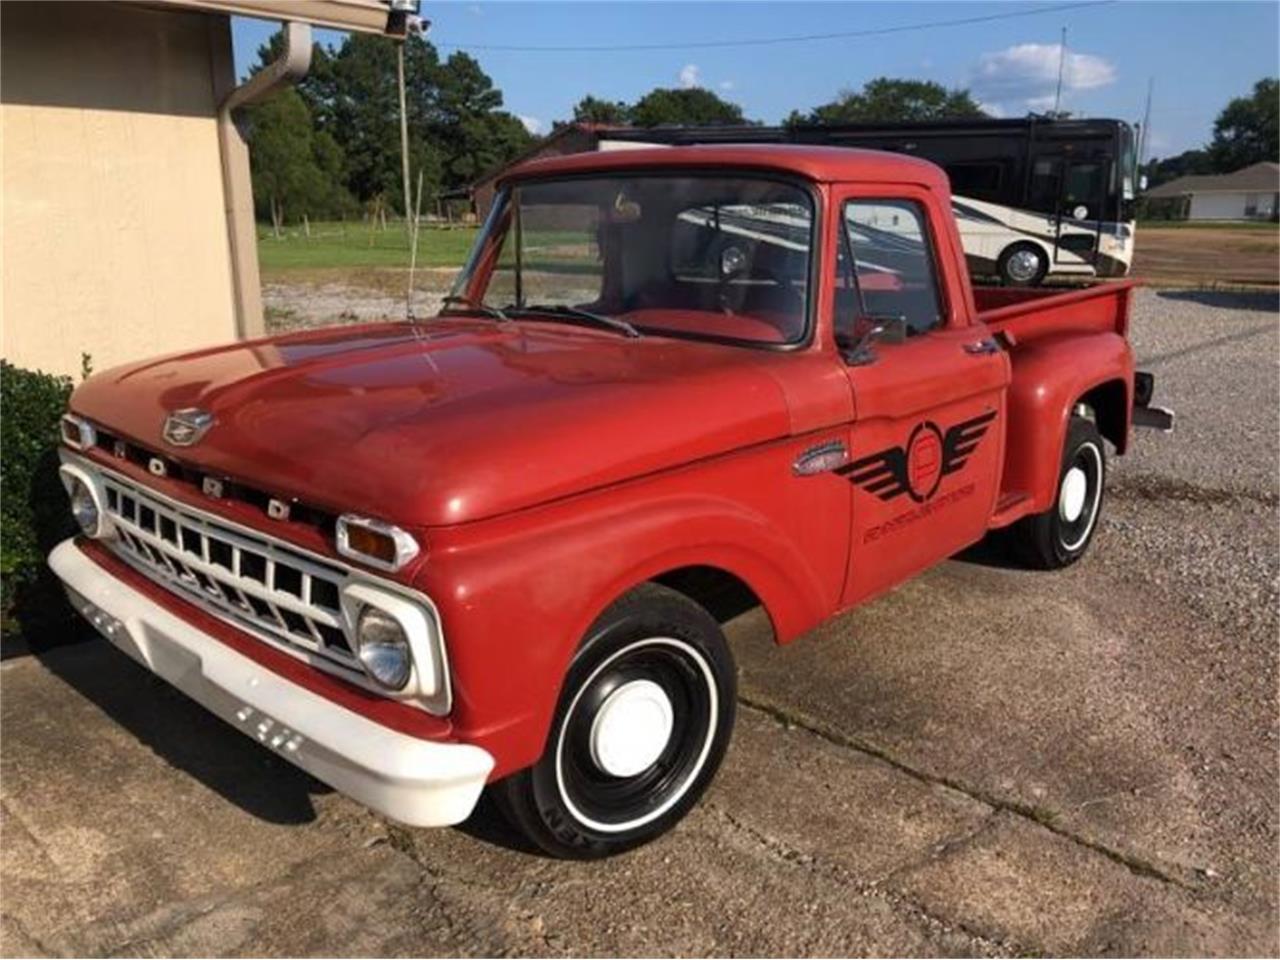 for sale 1965 ford f100 in cadillac, michigan cars - cadillac, mi at geebo